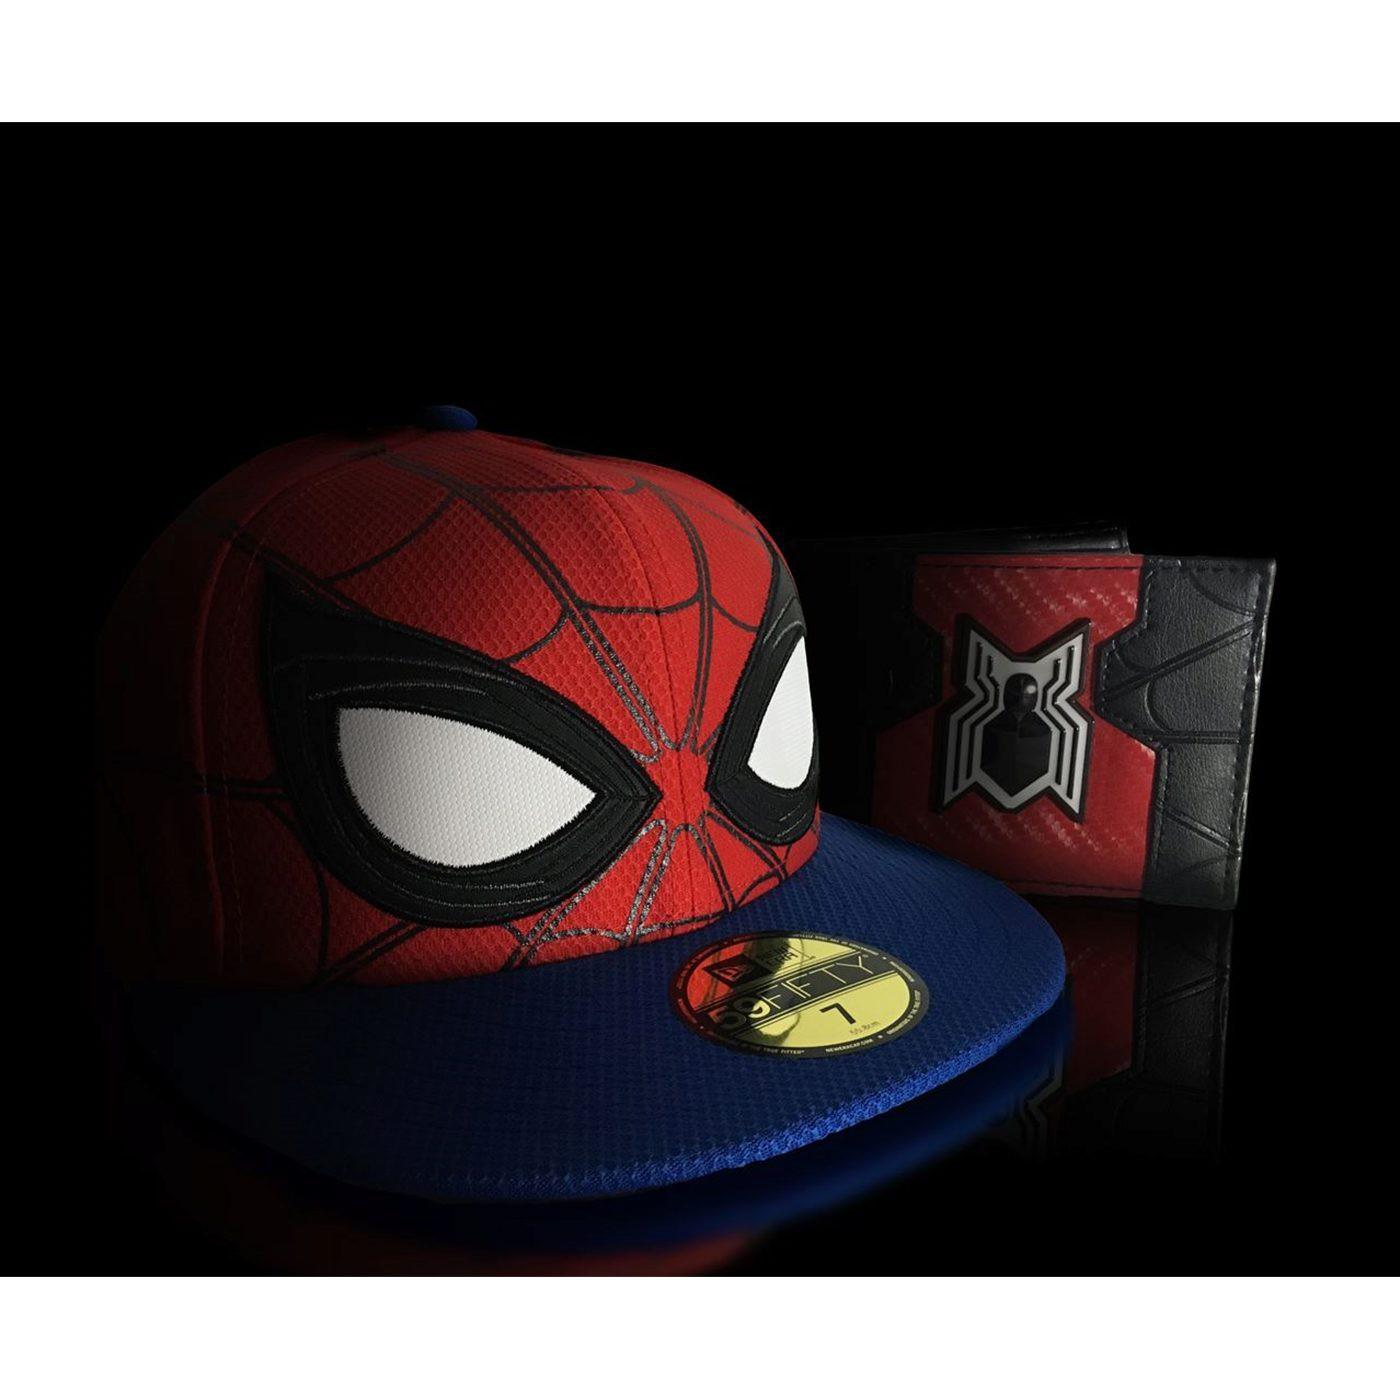 Spider-Man Homecoming Symbol Bi-Fold Wallet